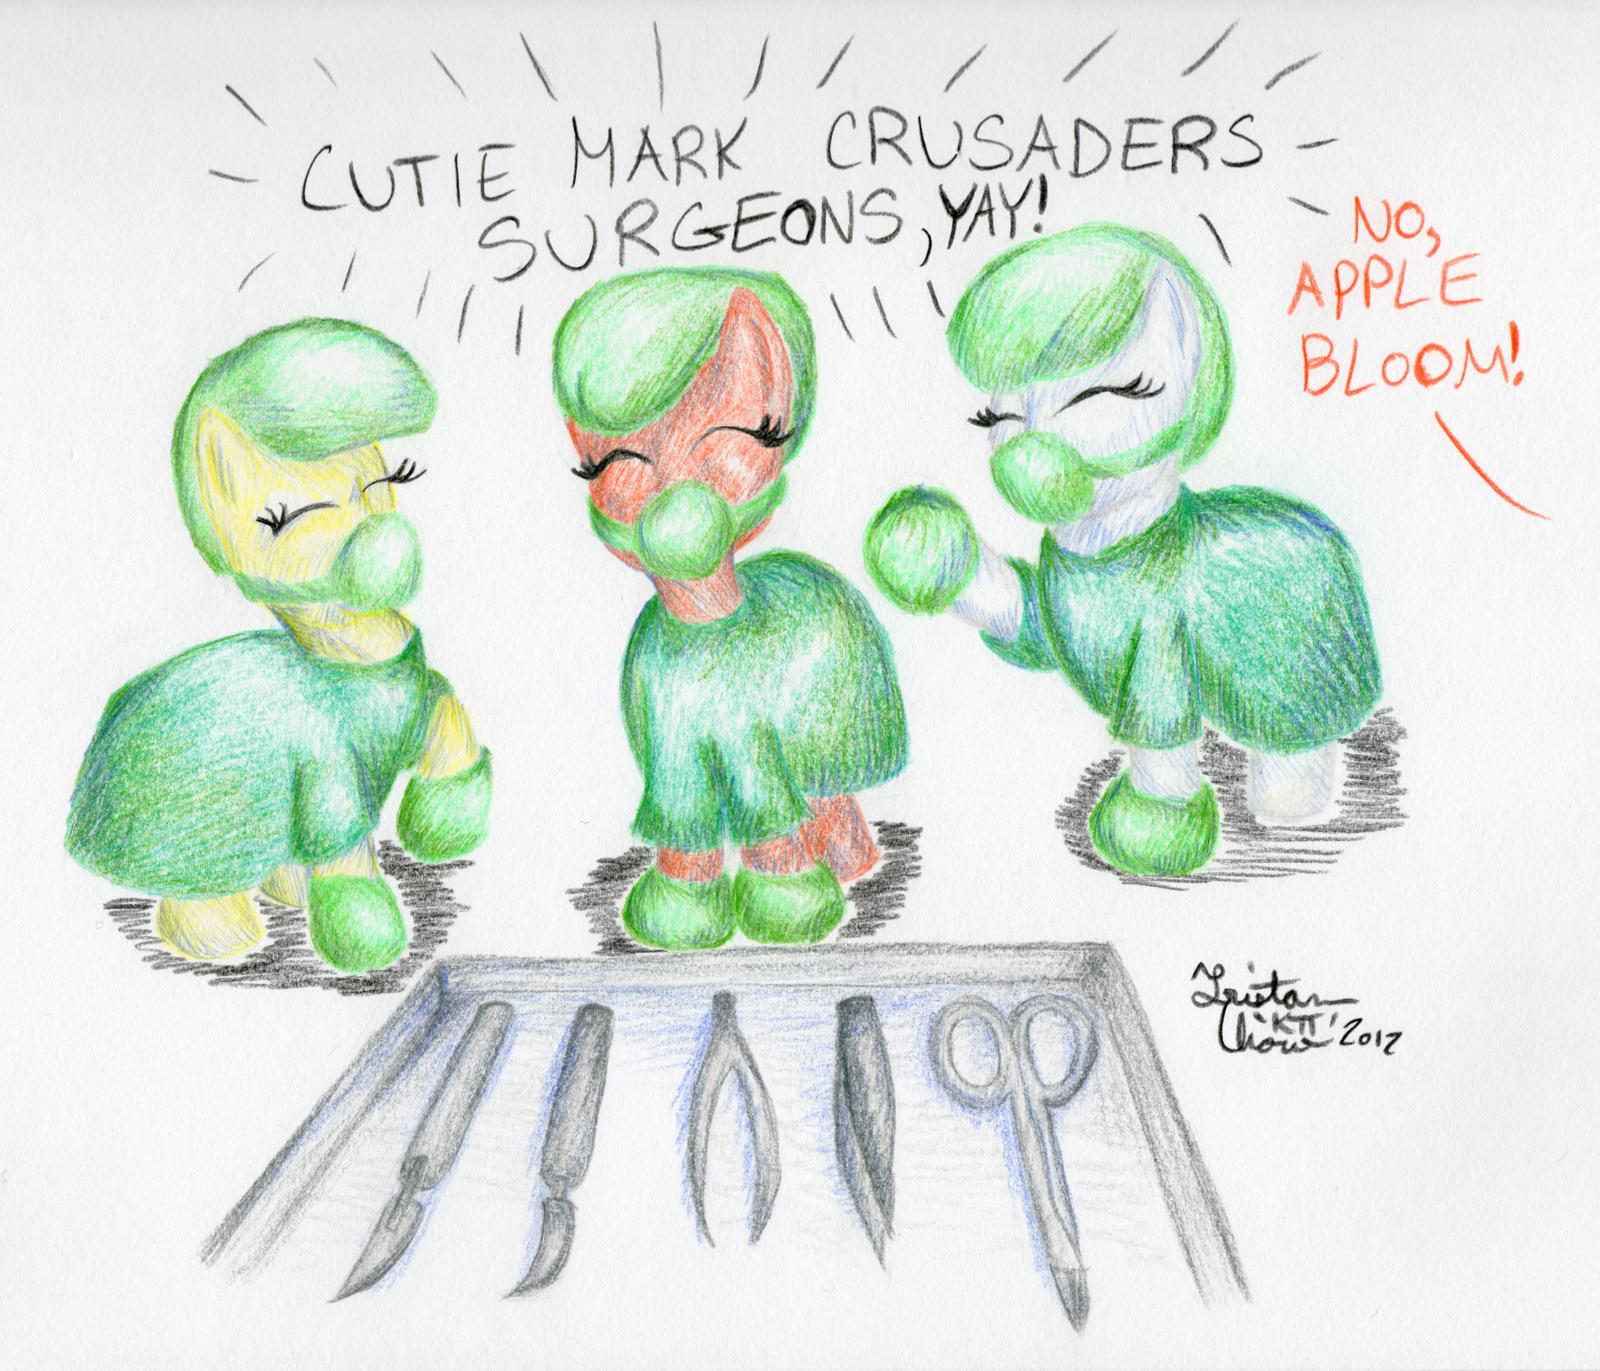 Aug NATG2012 8: Cutie Mark Crusader Surgeons, Yay! by KuroiTsubasaTenshi